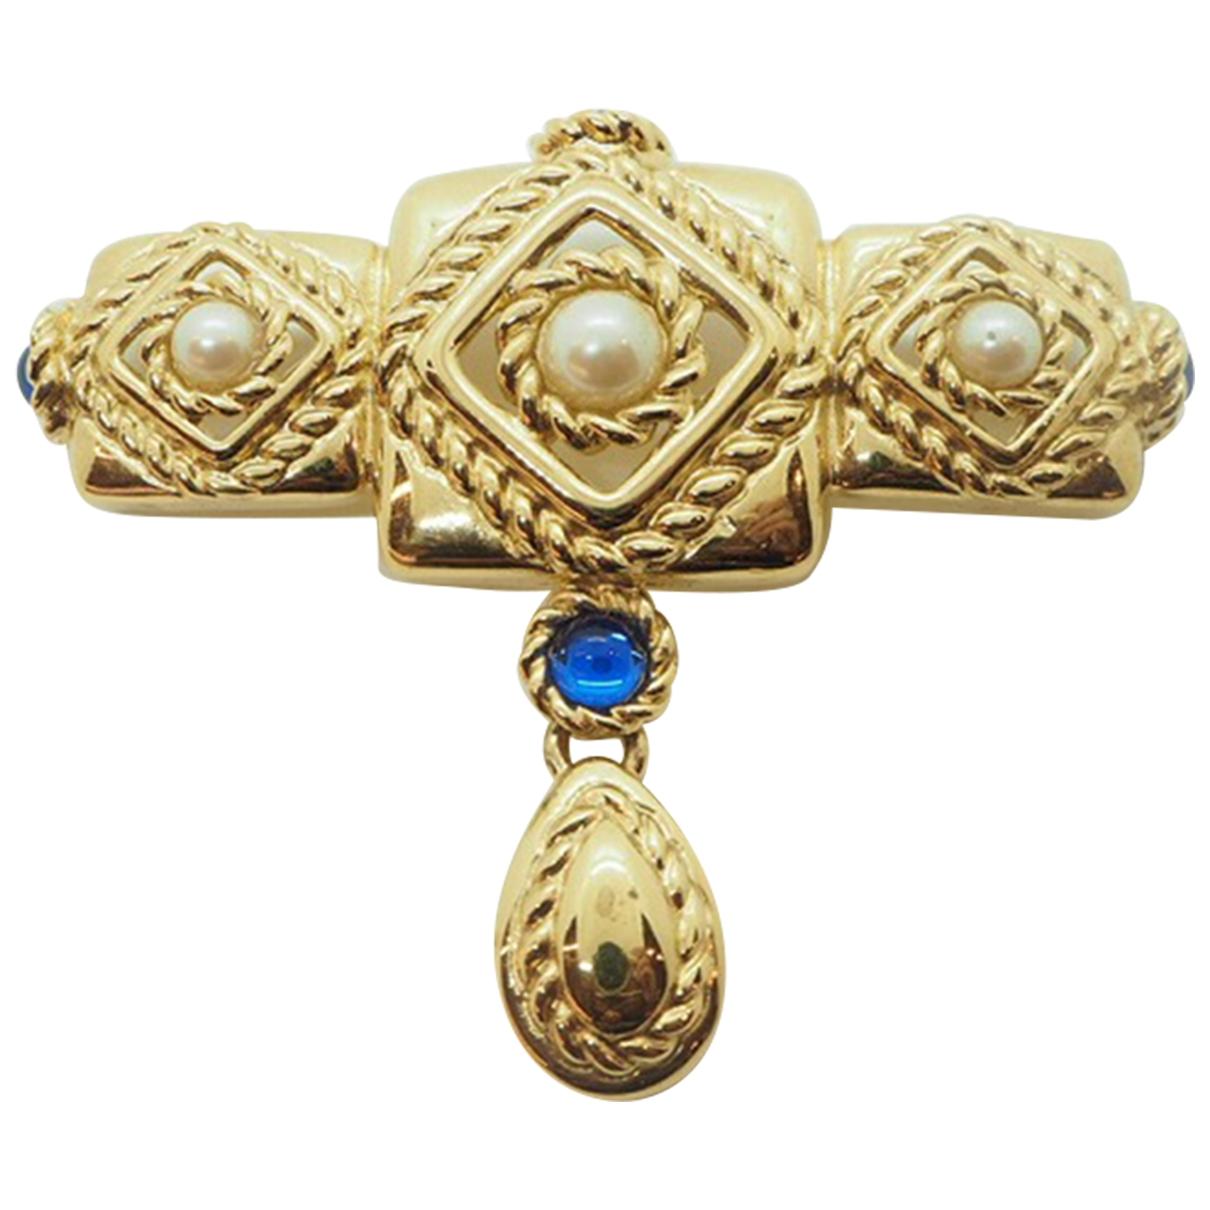 Givenchy \N Brosche in  Gold Vergoldet